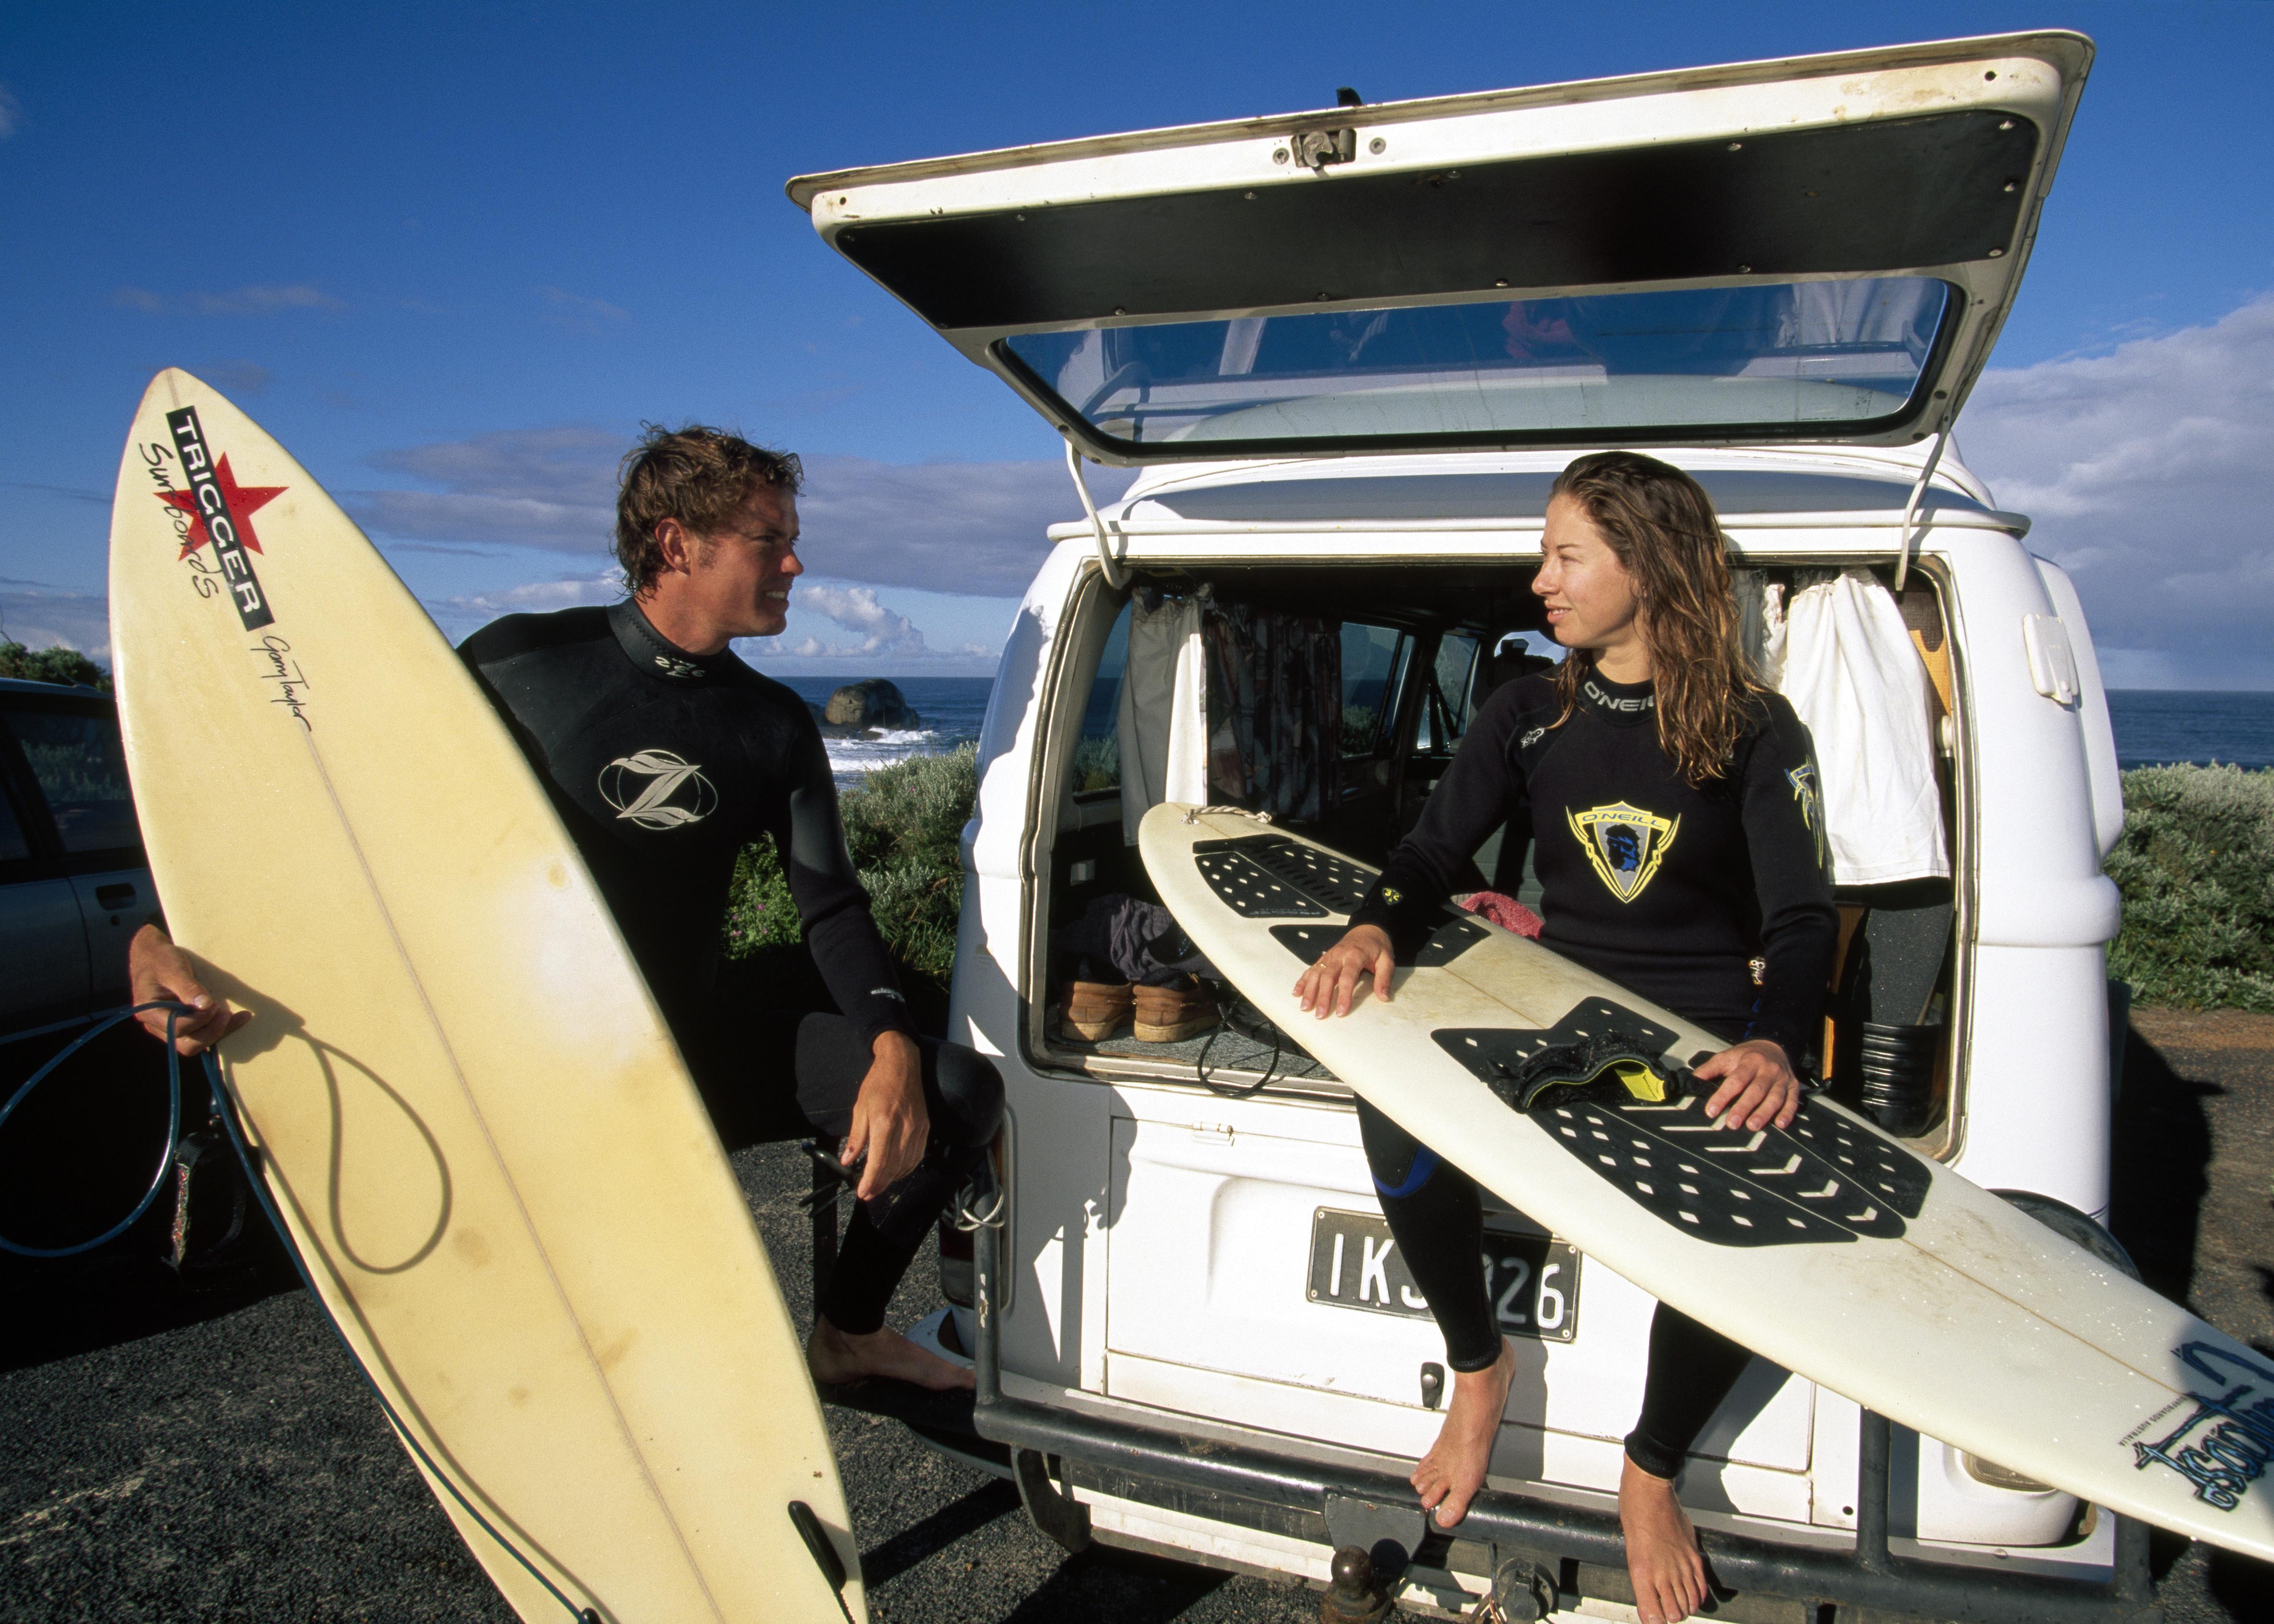 SurferCamper_PhotoCredit_TourismAustralia_TomKeating.jpg